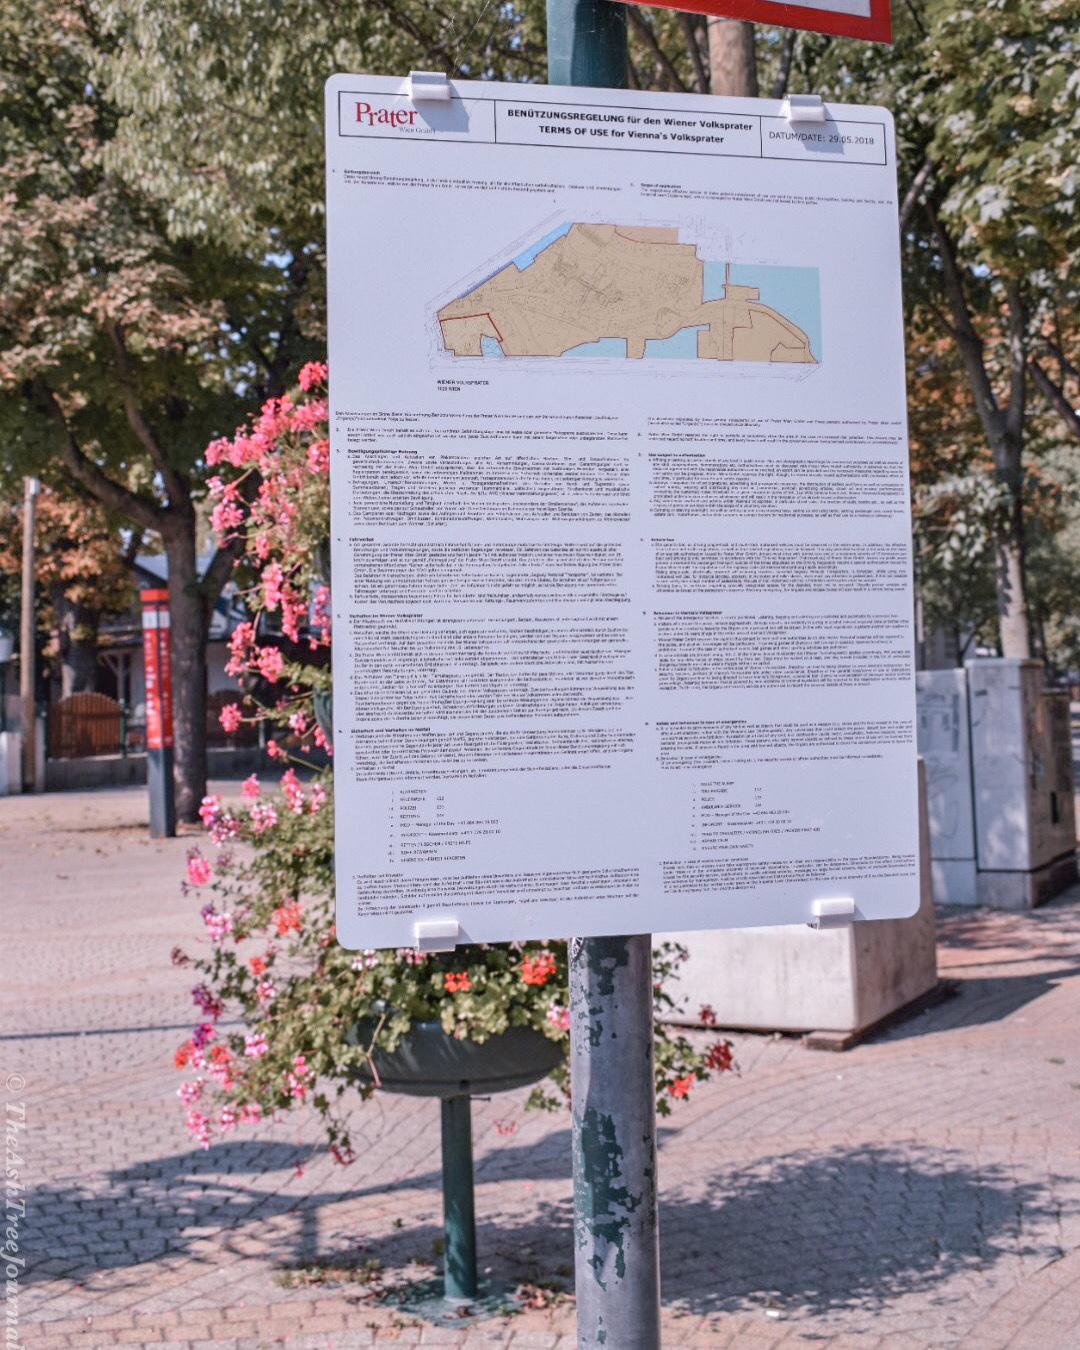 the ash tree journal prater park vienna rides